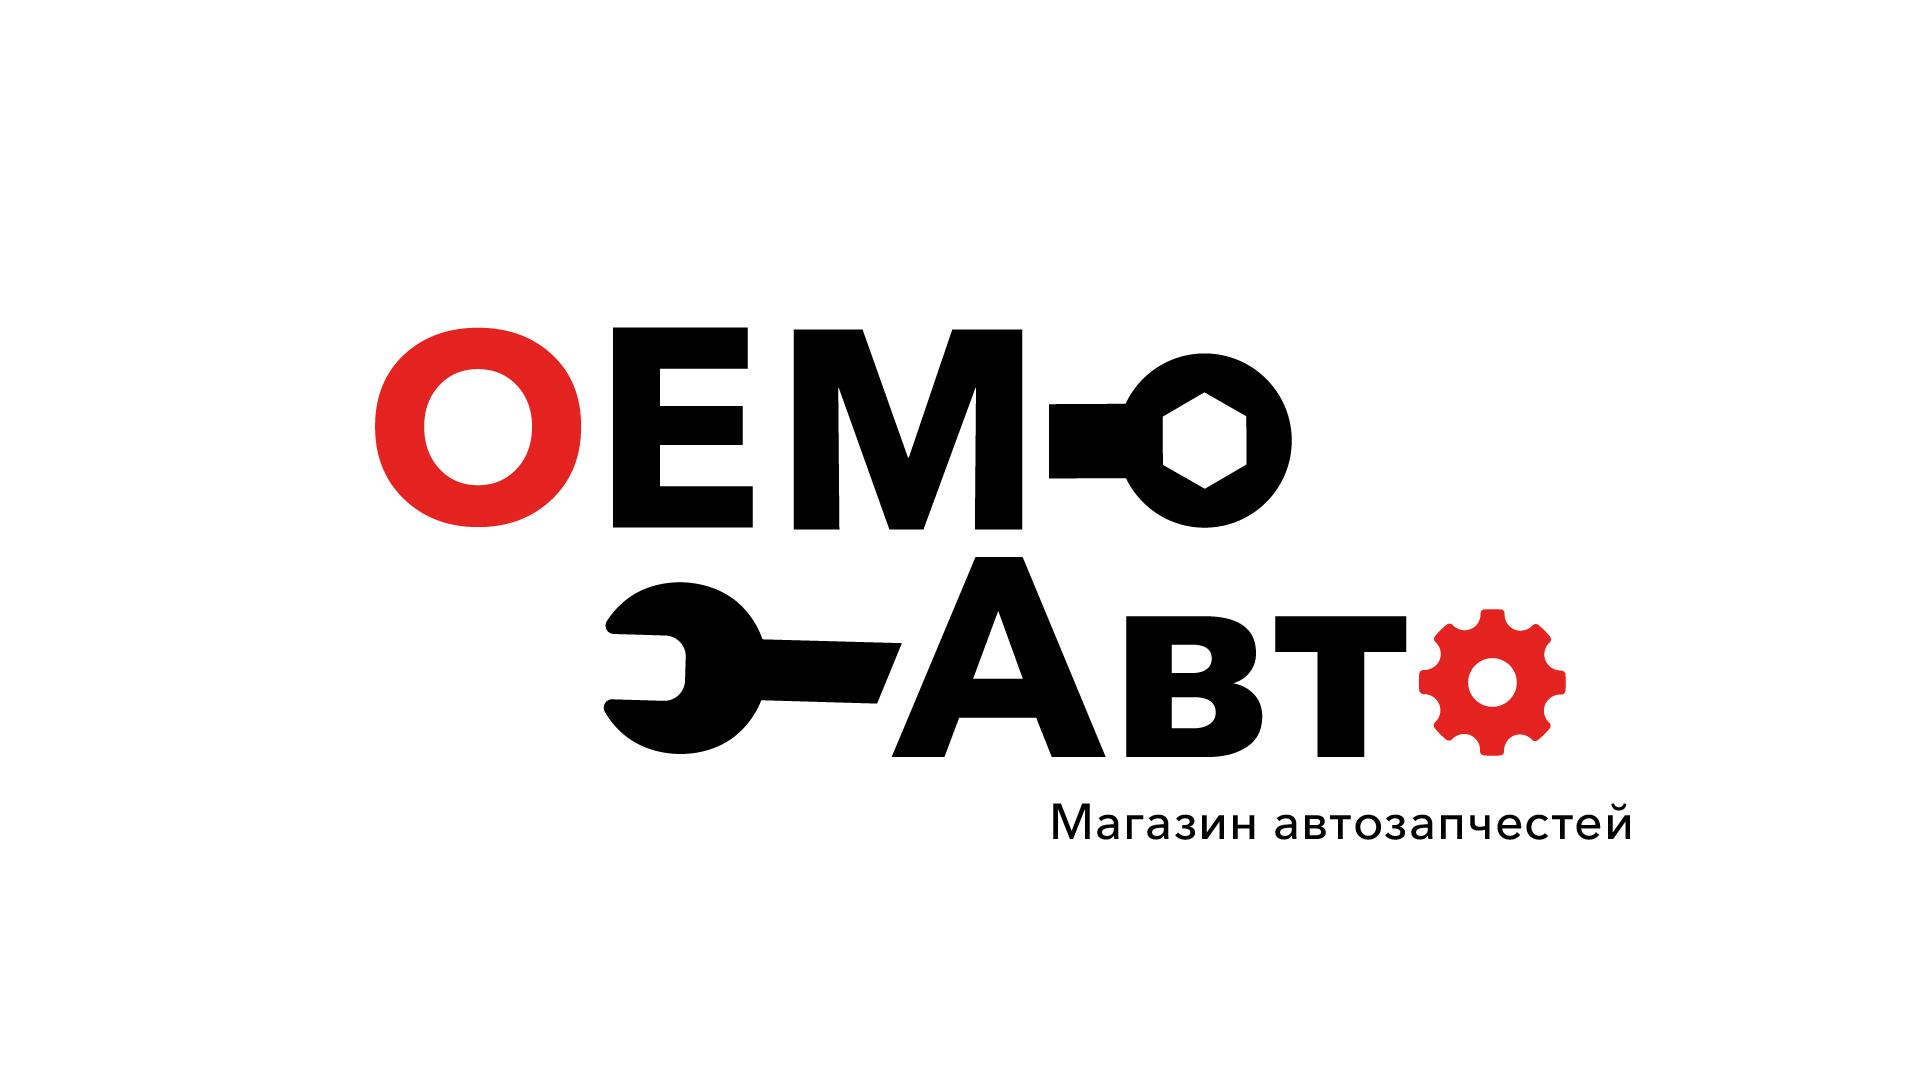 Разработать логотип и дизайн визитки  фото f_7515b685eccf3934.jpg